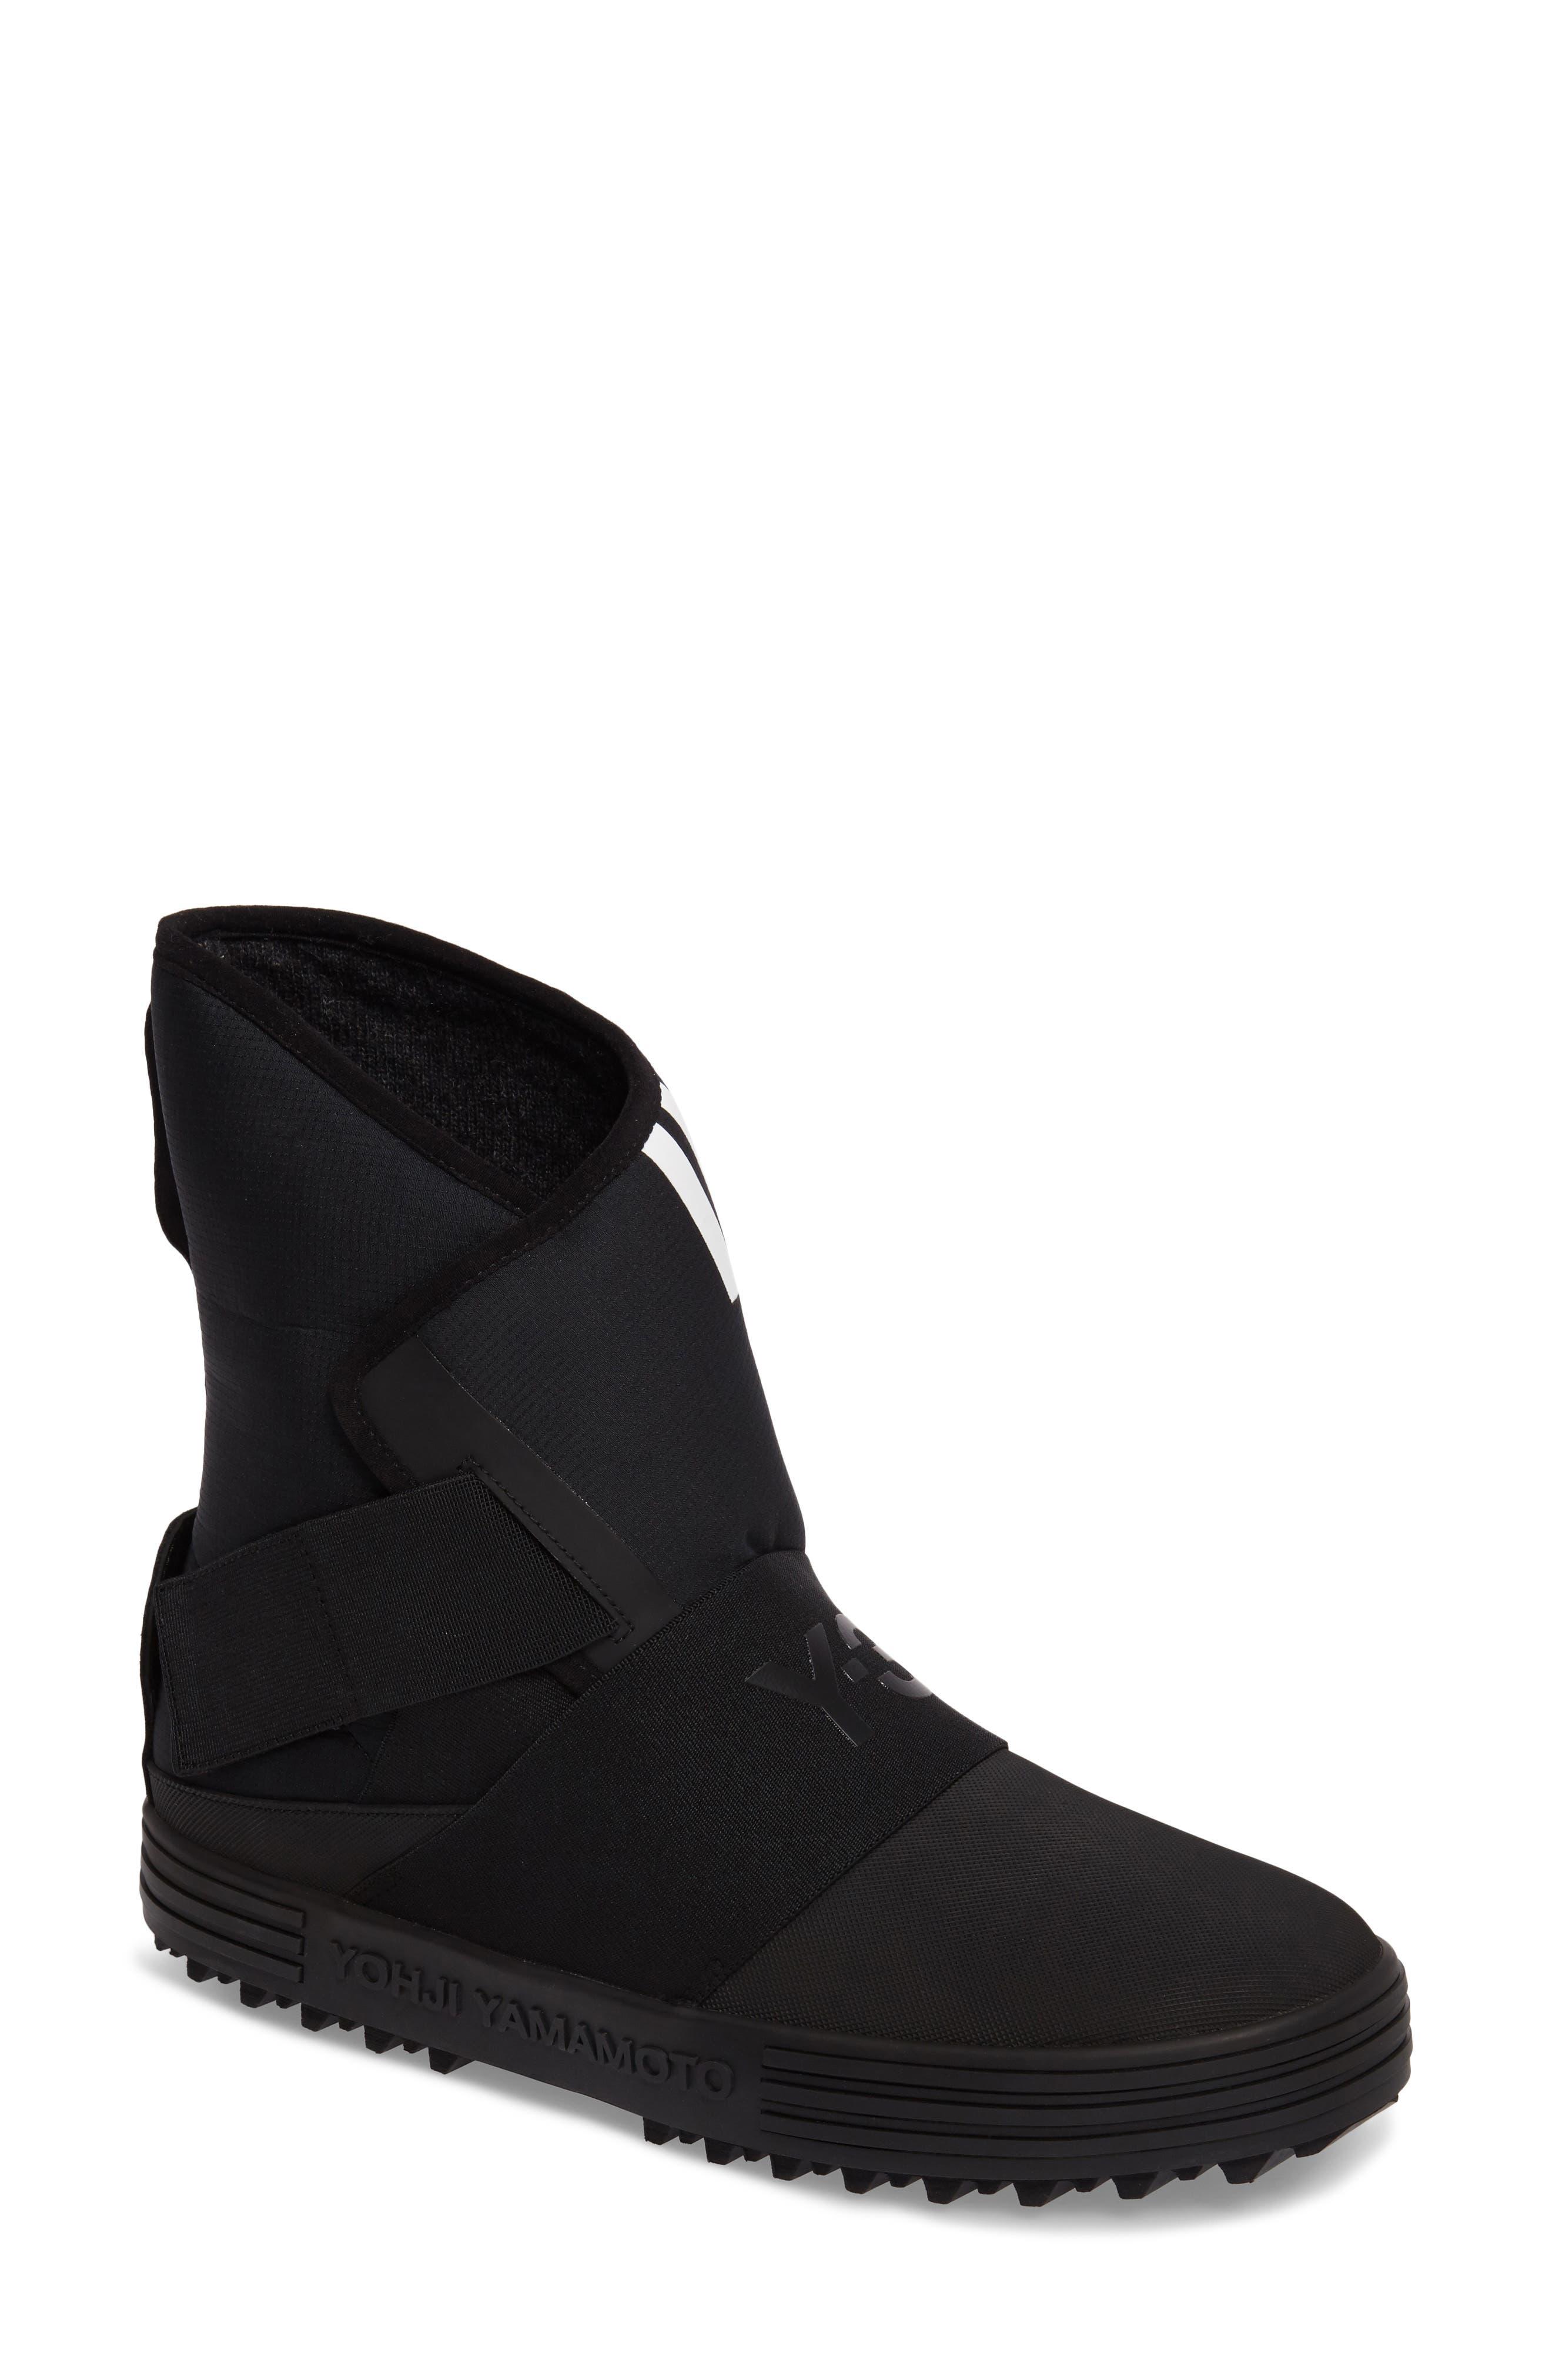 Sno Foxing High Top Sneaker,                         Main,                         color, 001